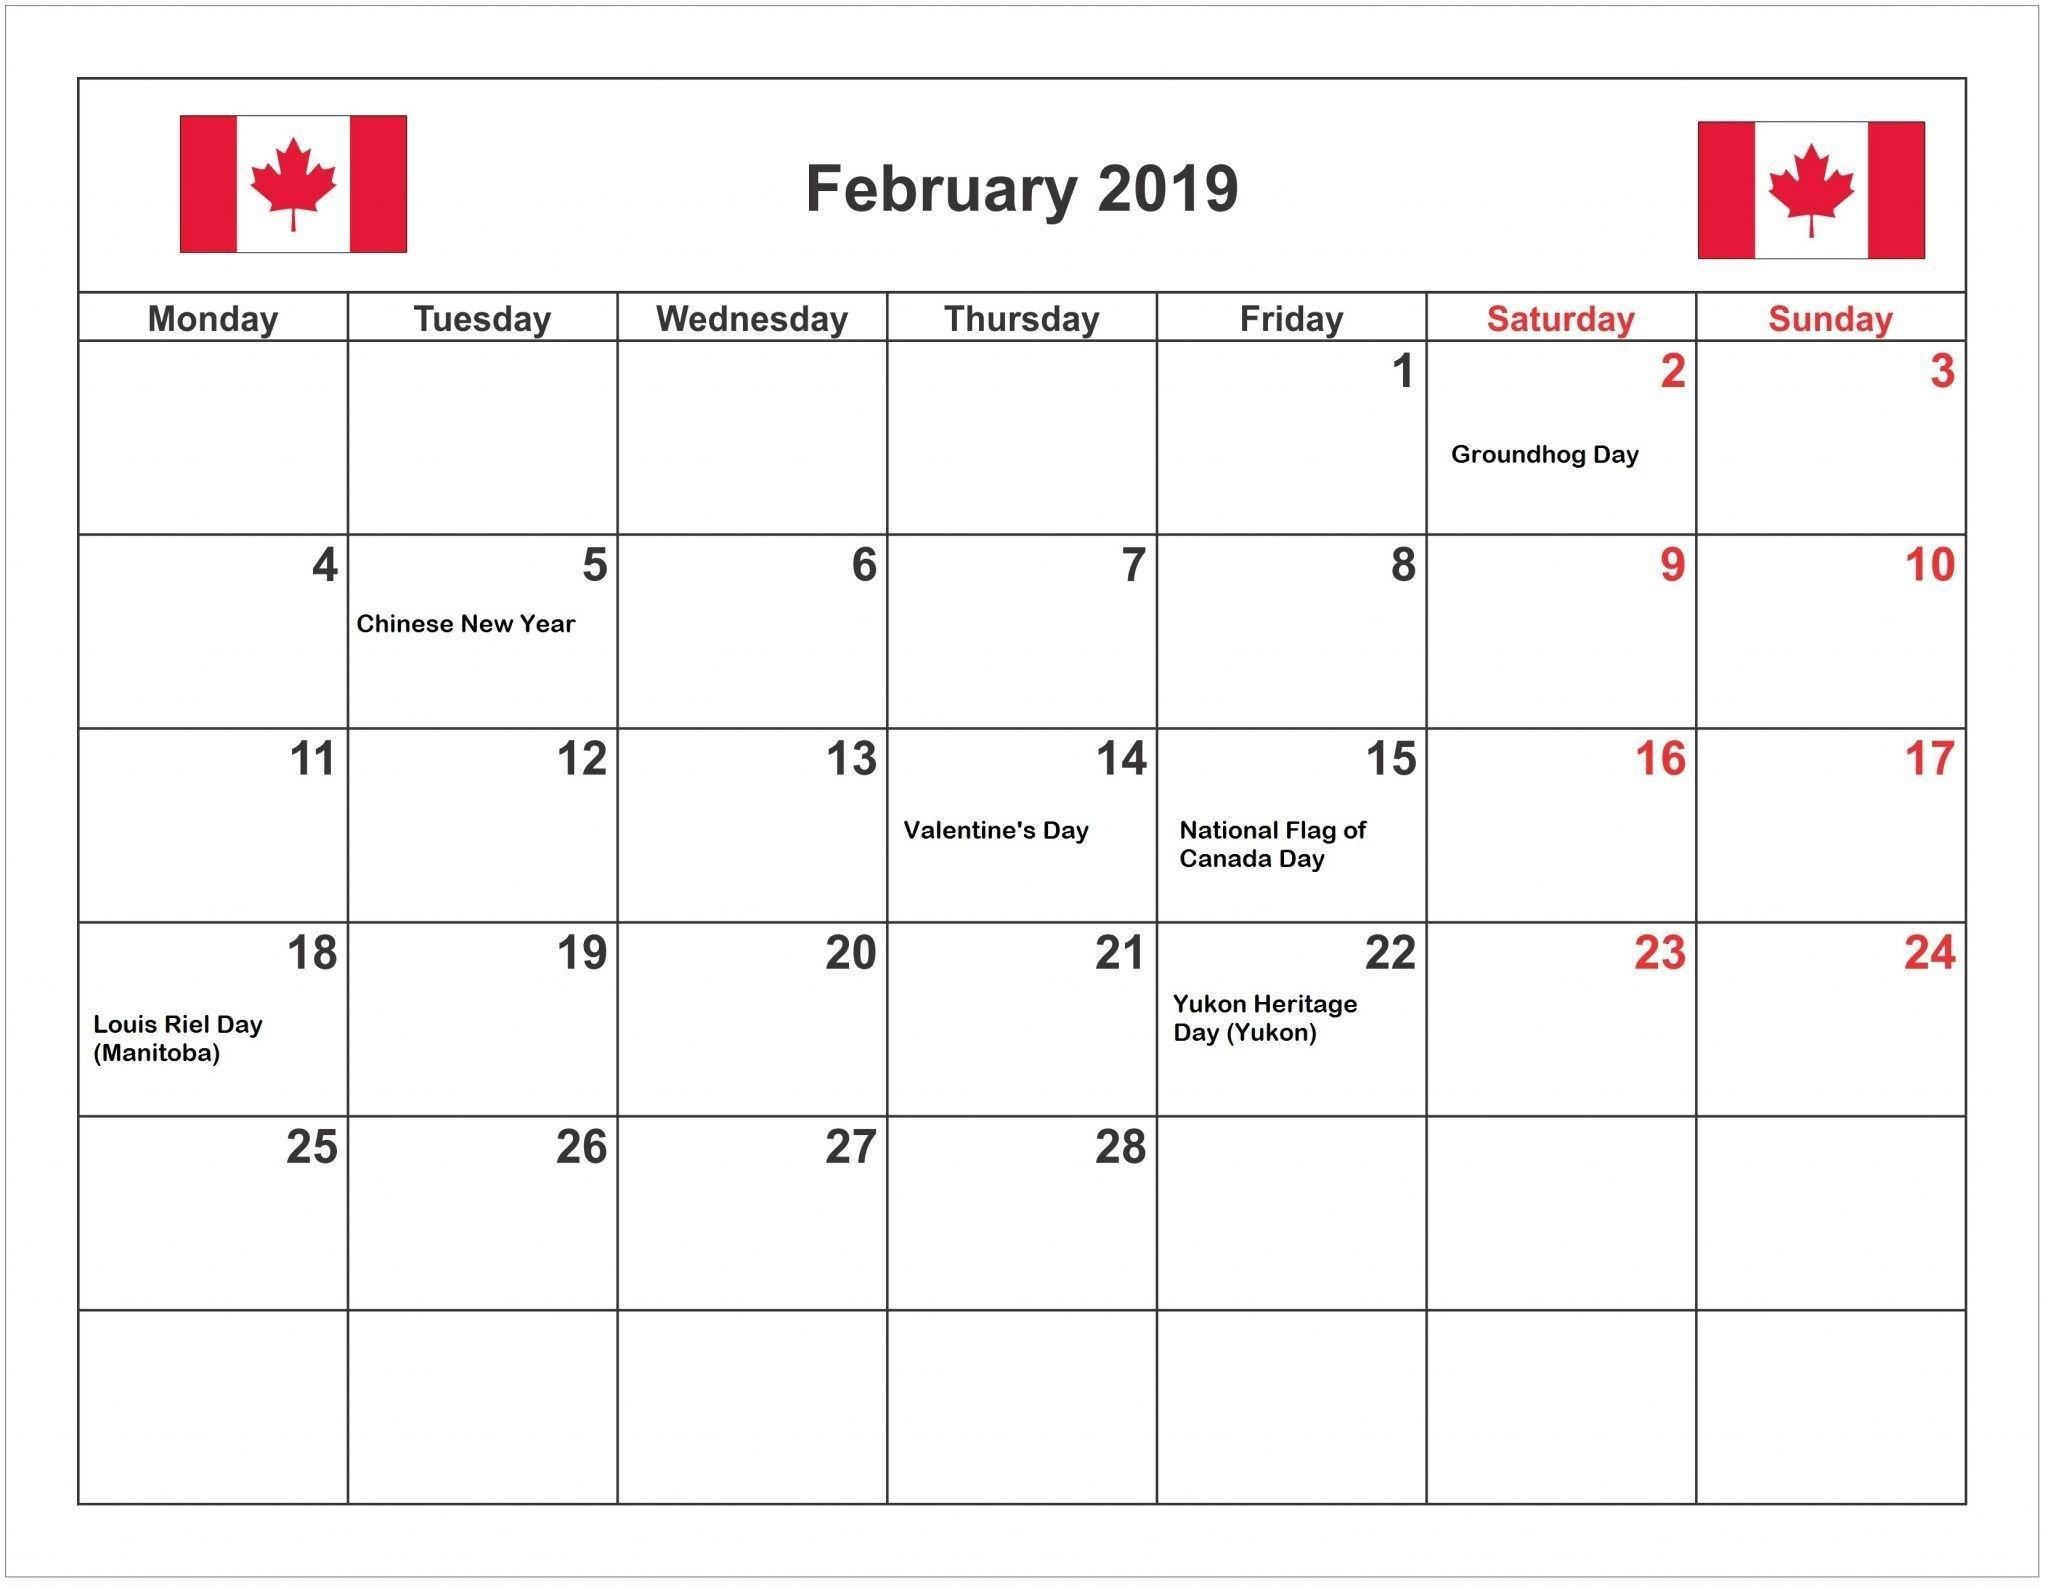 February 2019 Calendar Canada With Holidays   February 2019 Calendar Calendar Of 2019 Canada